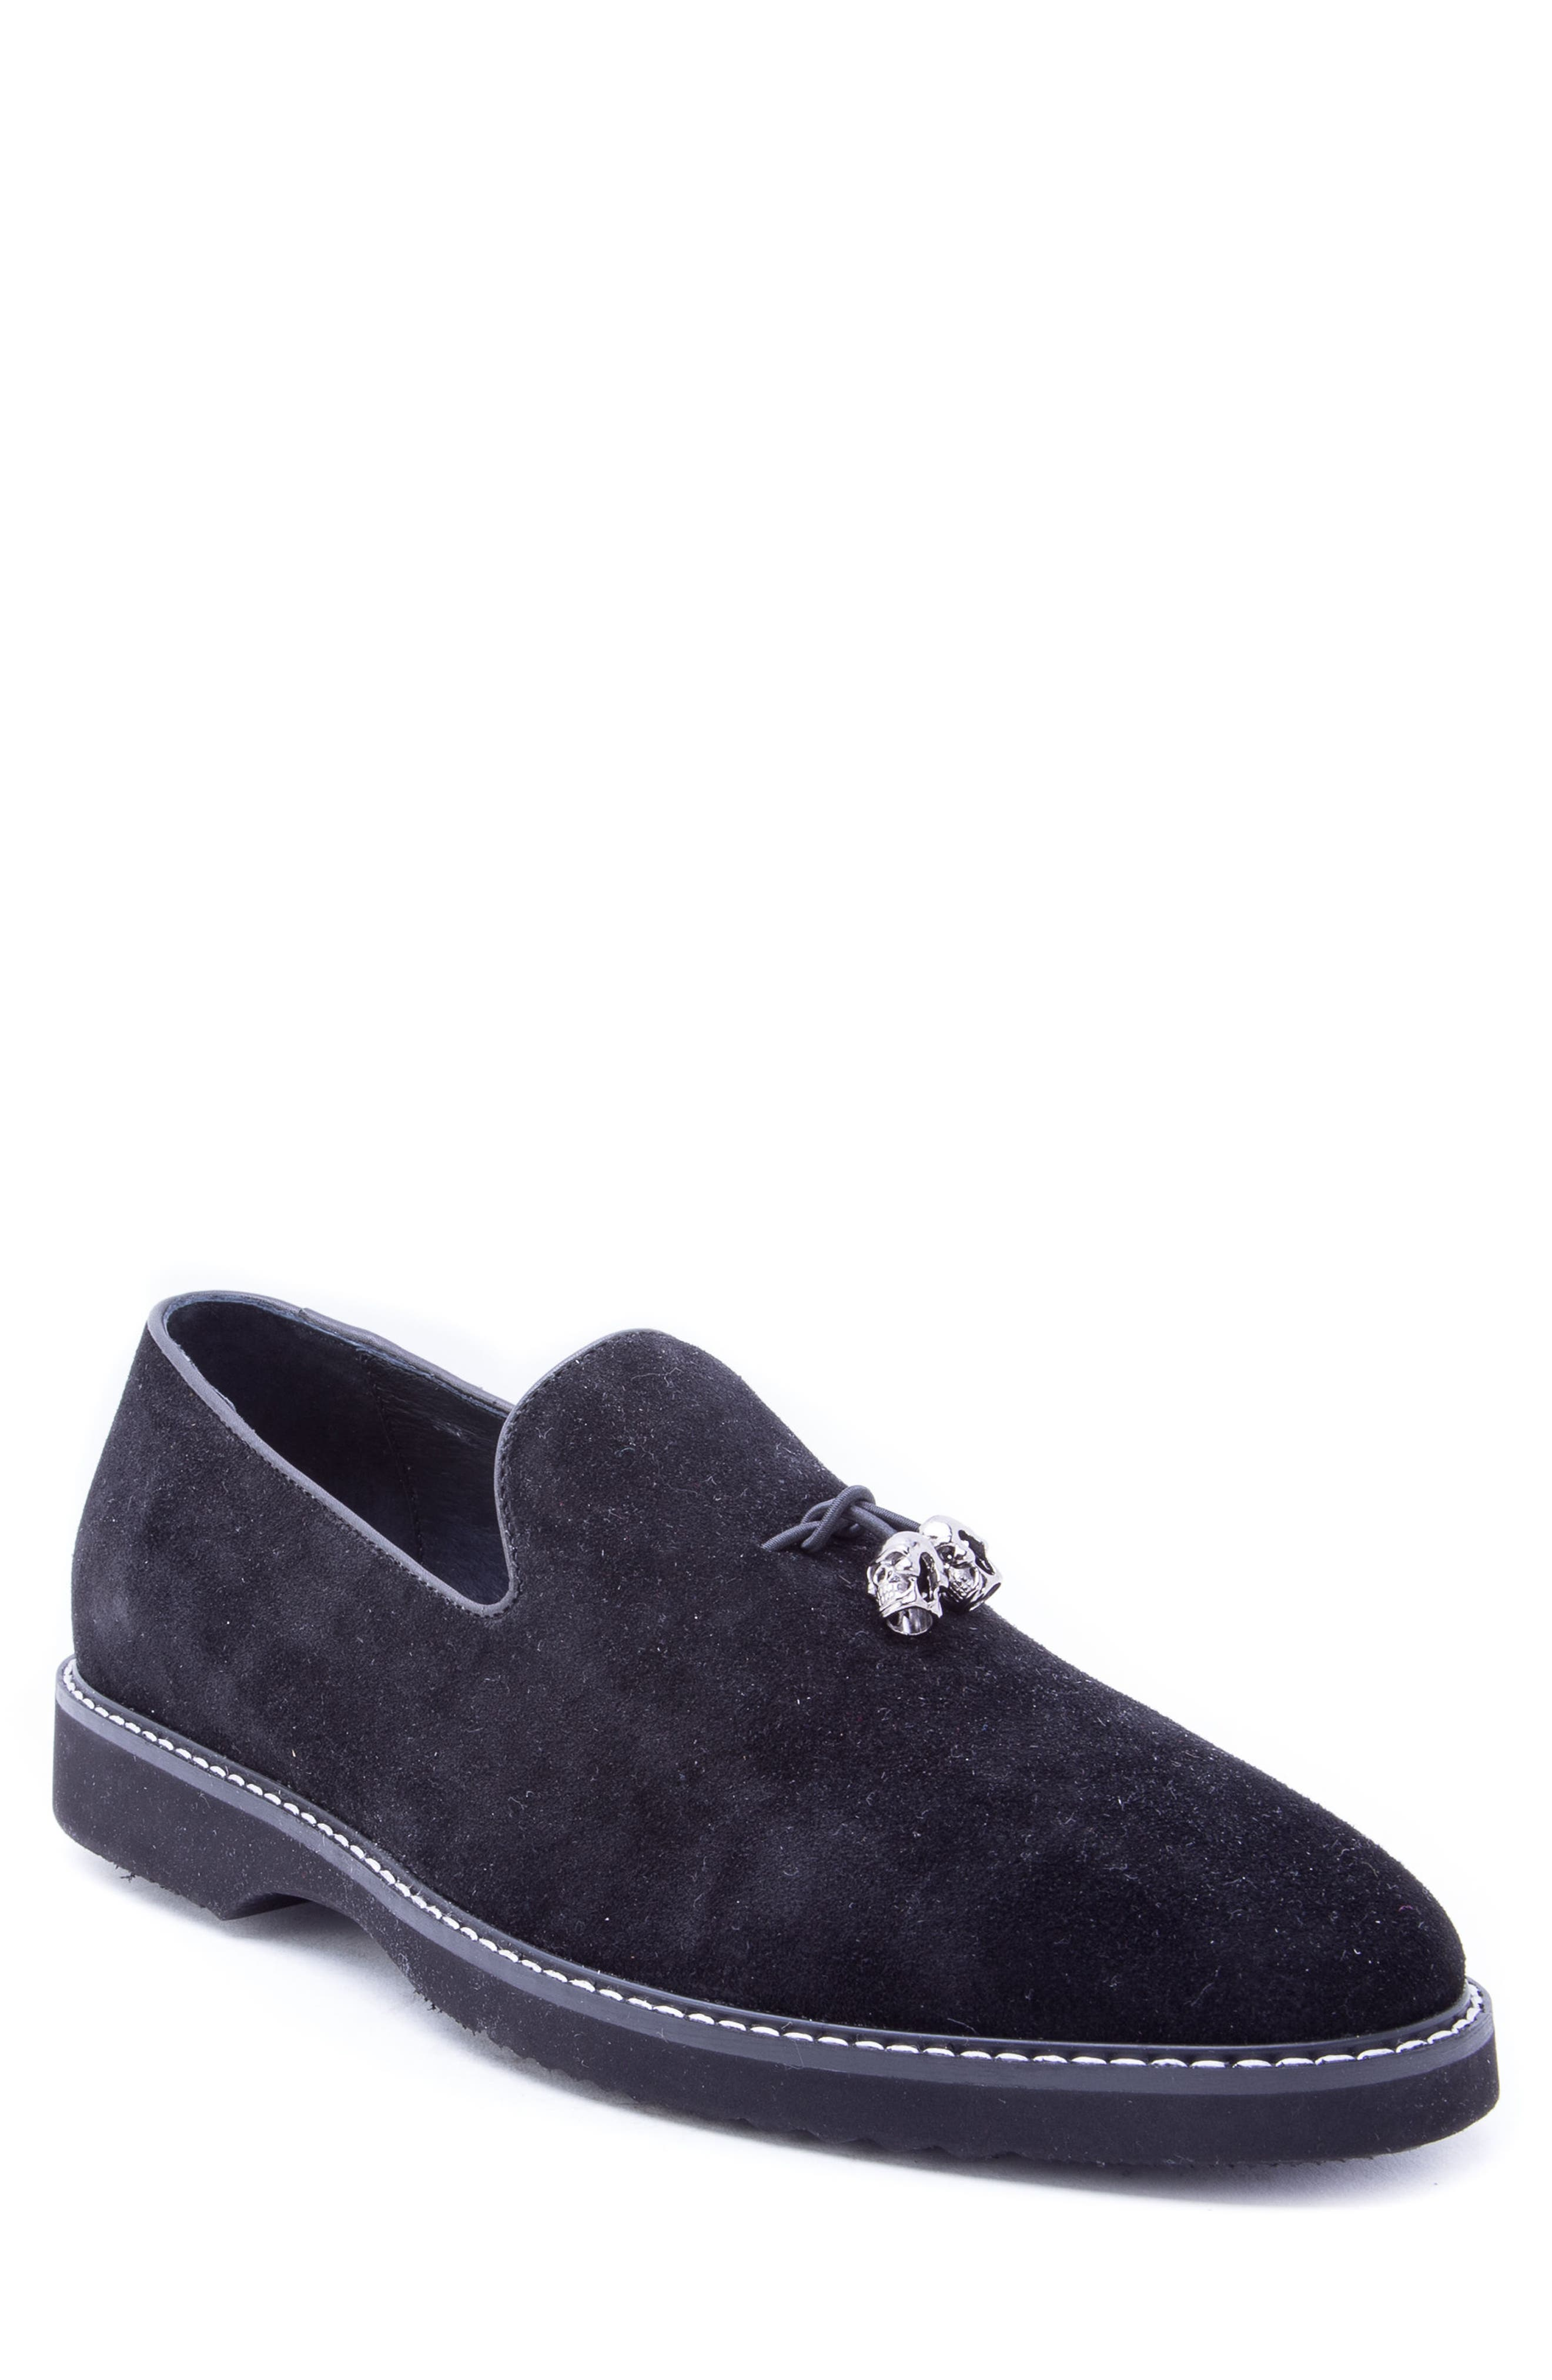 Heston Tassel Loafer,                             Main thumbnail 1, color,                             BLACK SUEDE